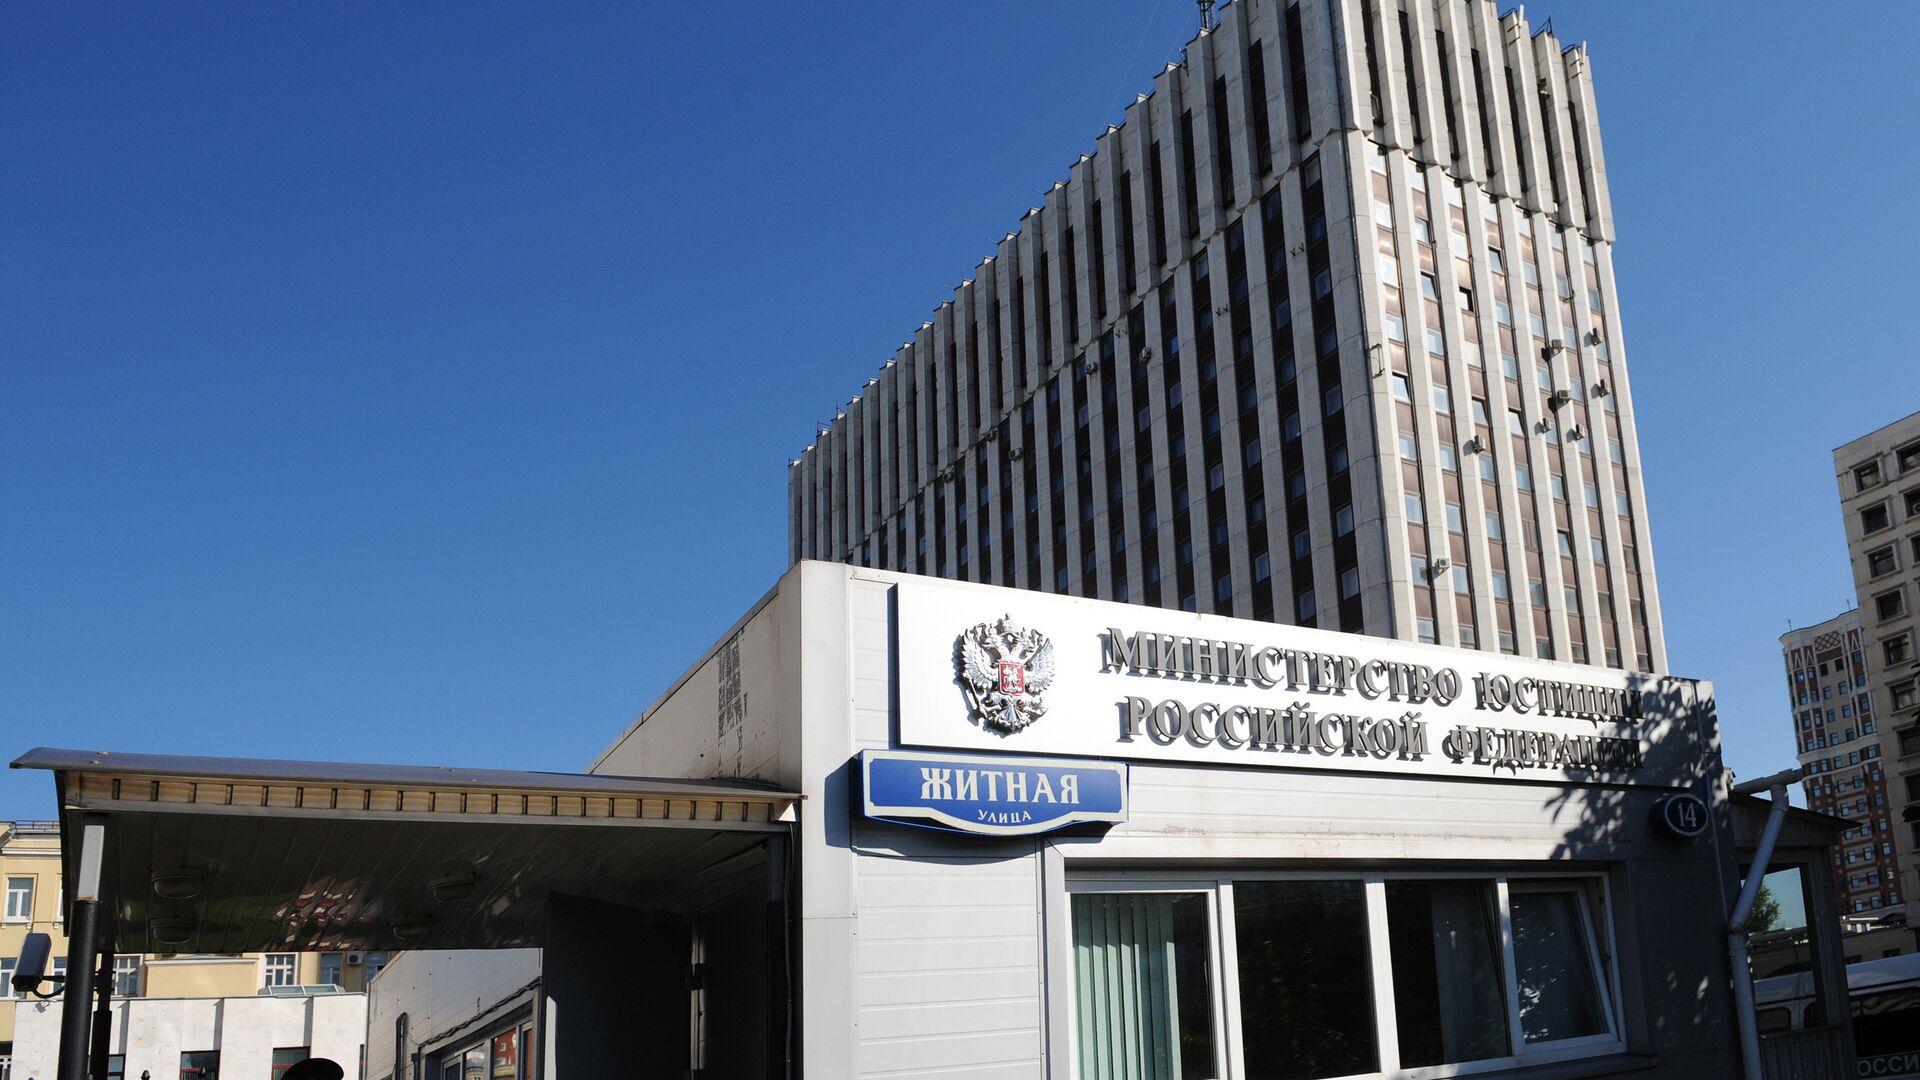 Здание Министерства юстиции России - РИА Новости, 1920, 29.10.2020